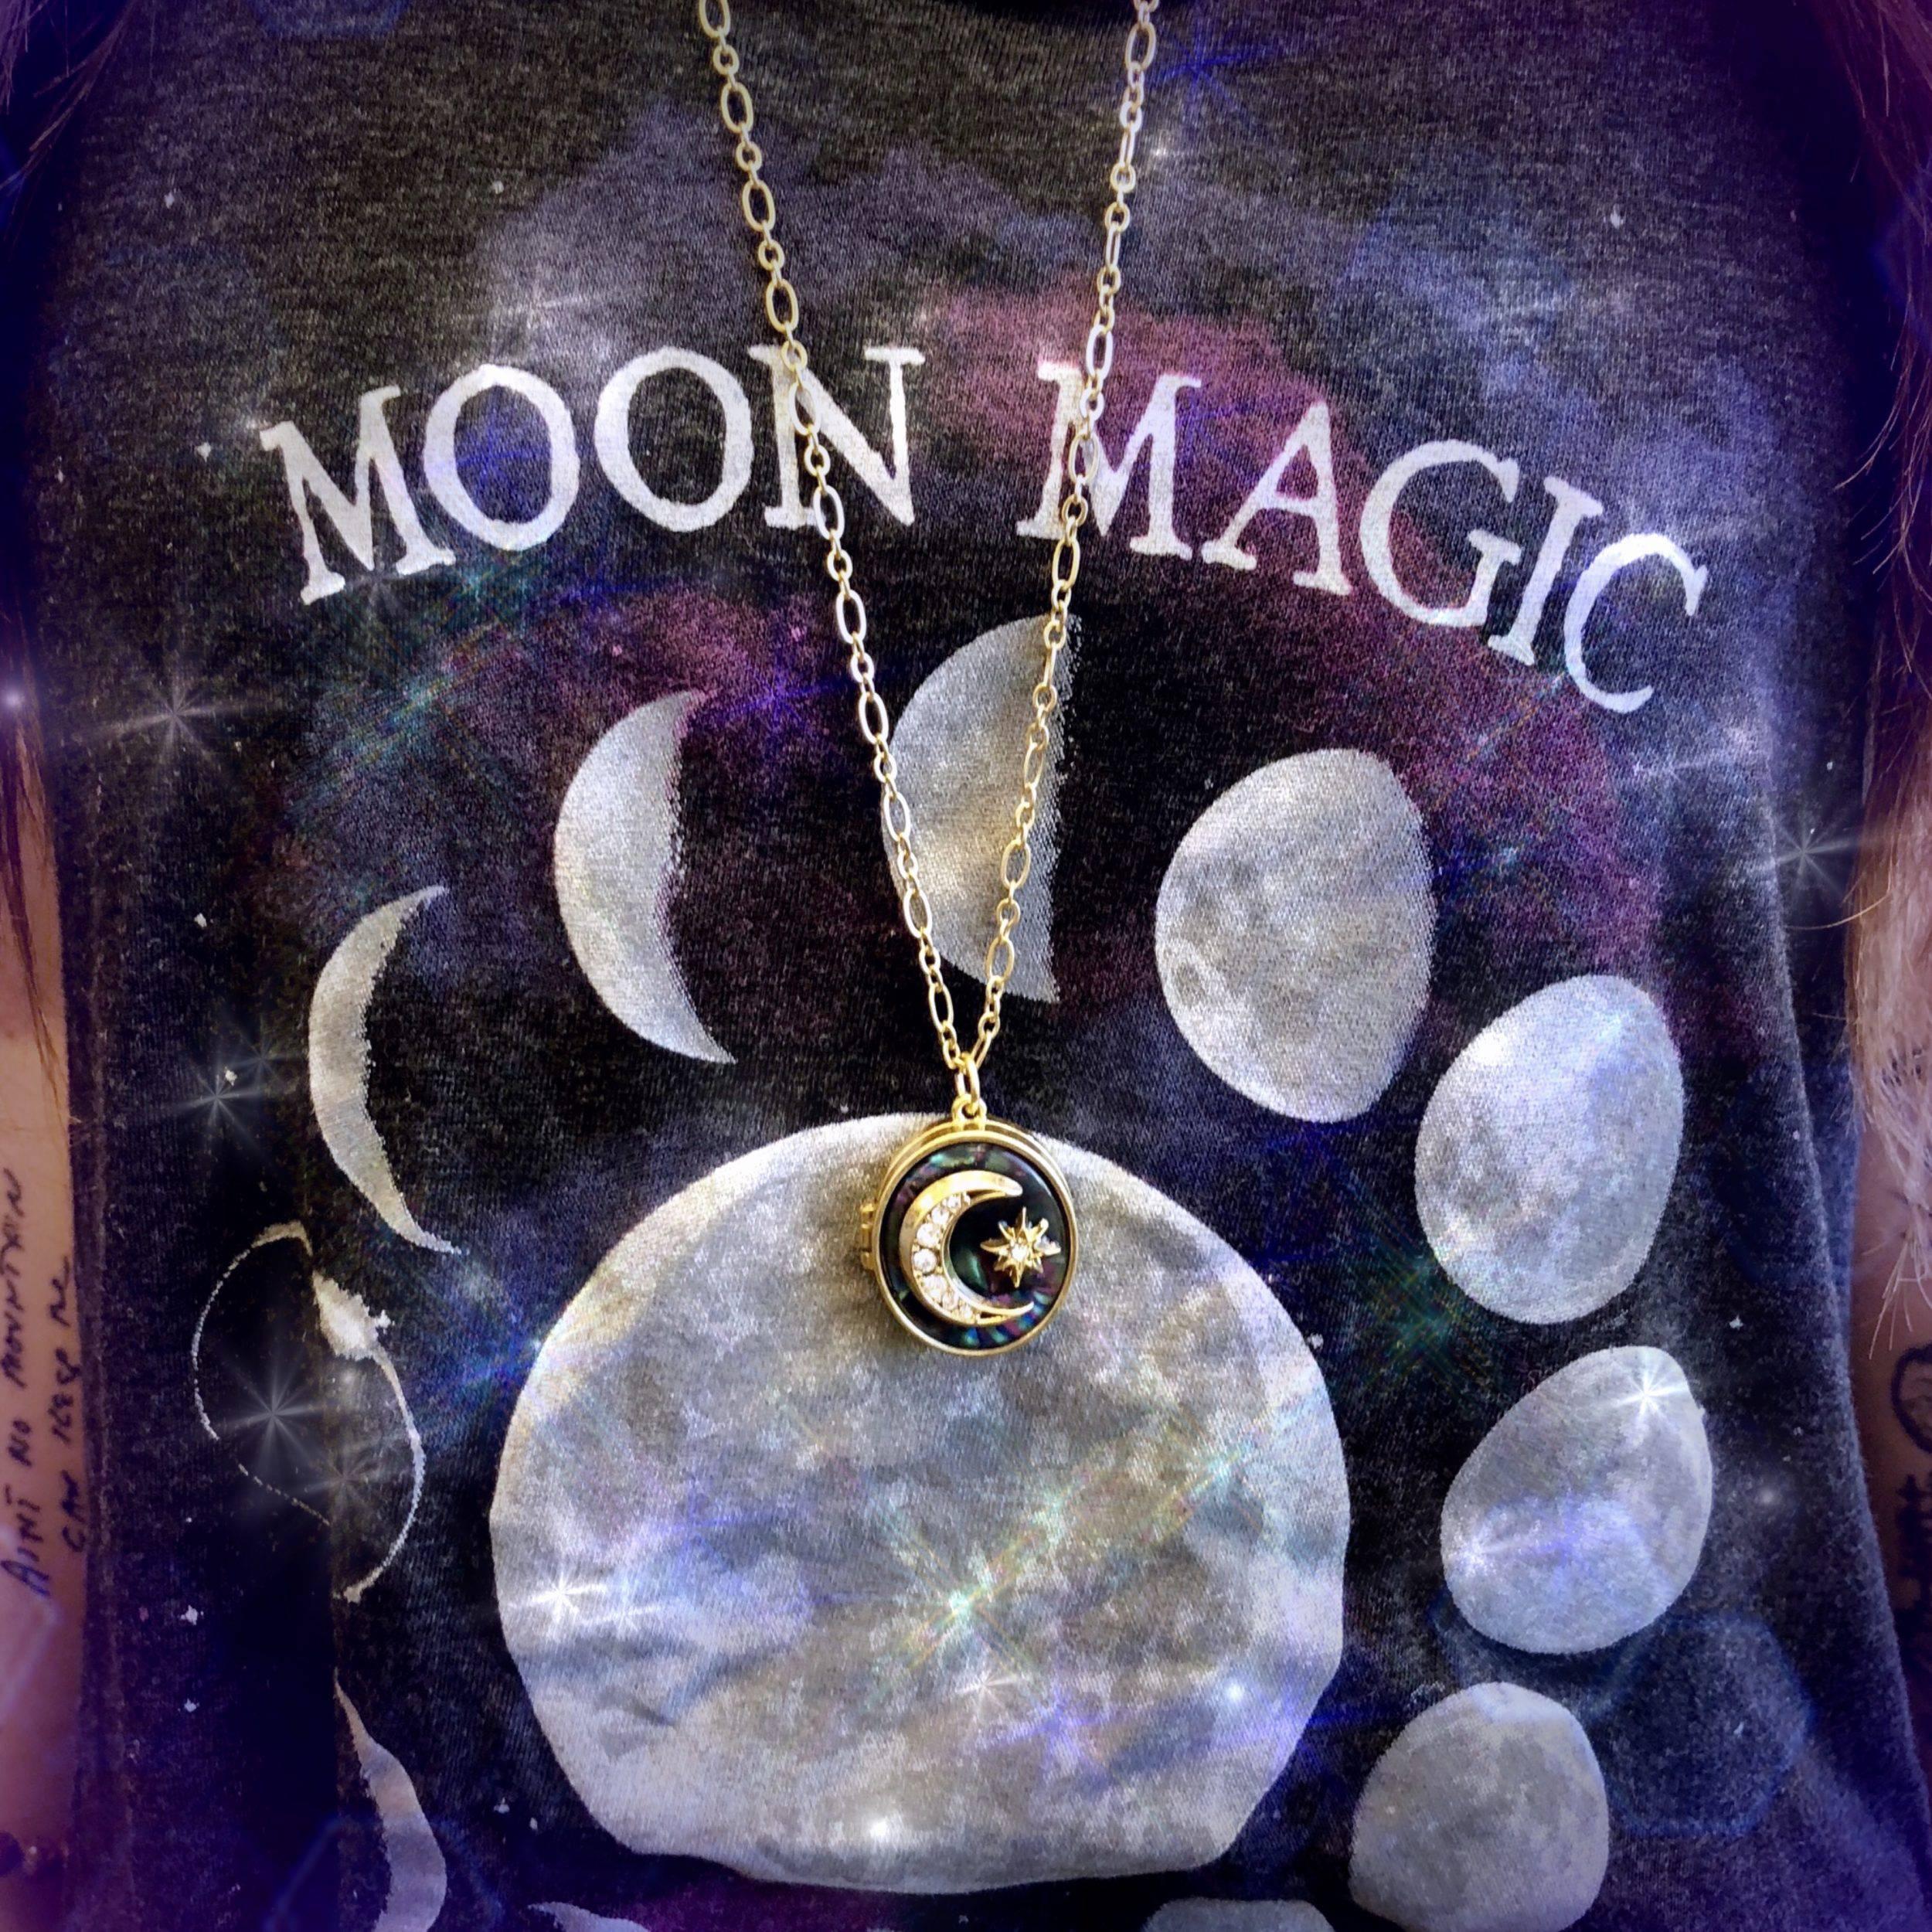 Moon_Love_Lockets_2of3_10_17